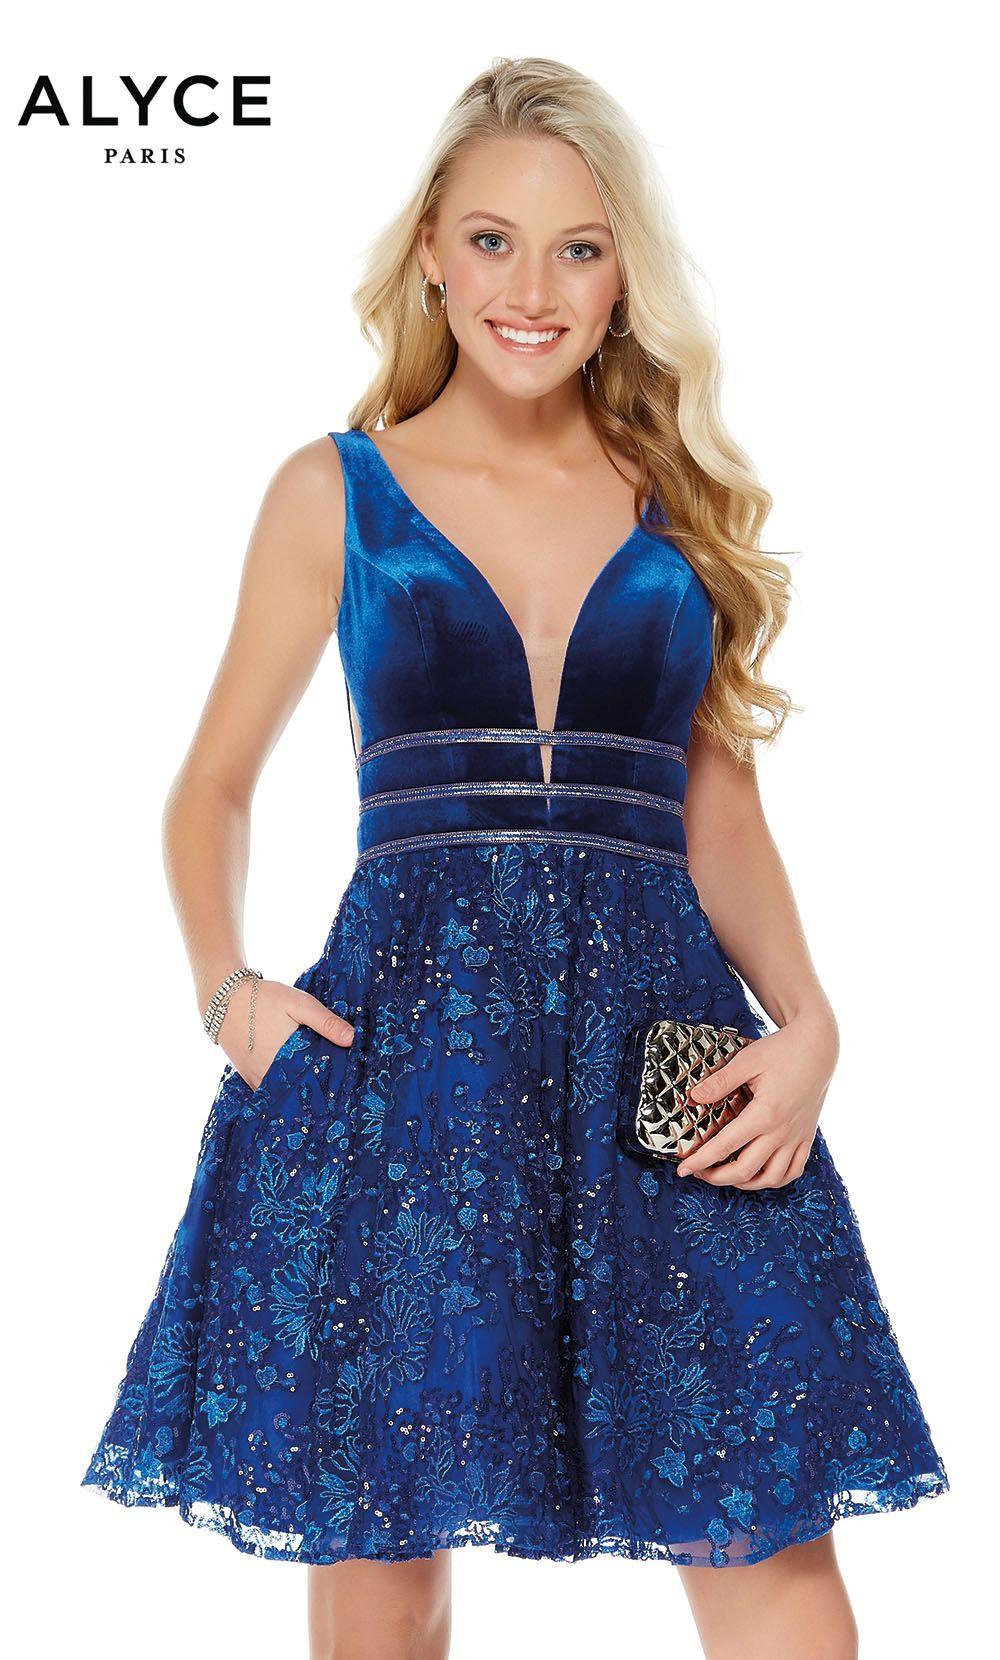 Alyce short skater dress with pockets deep v neckline and